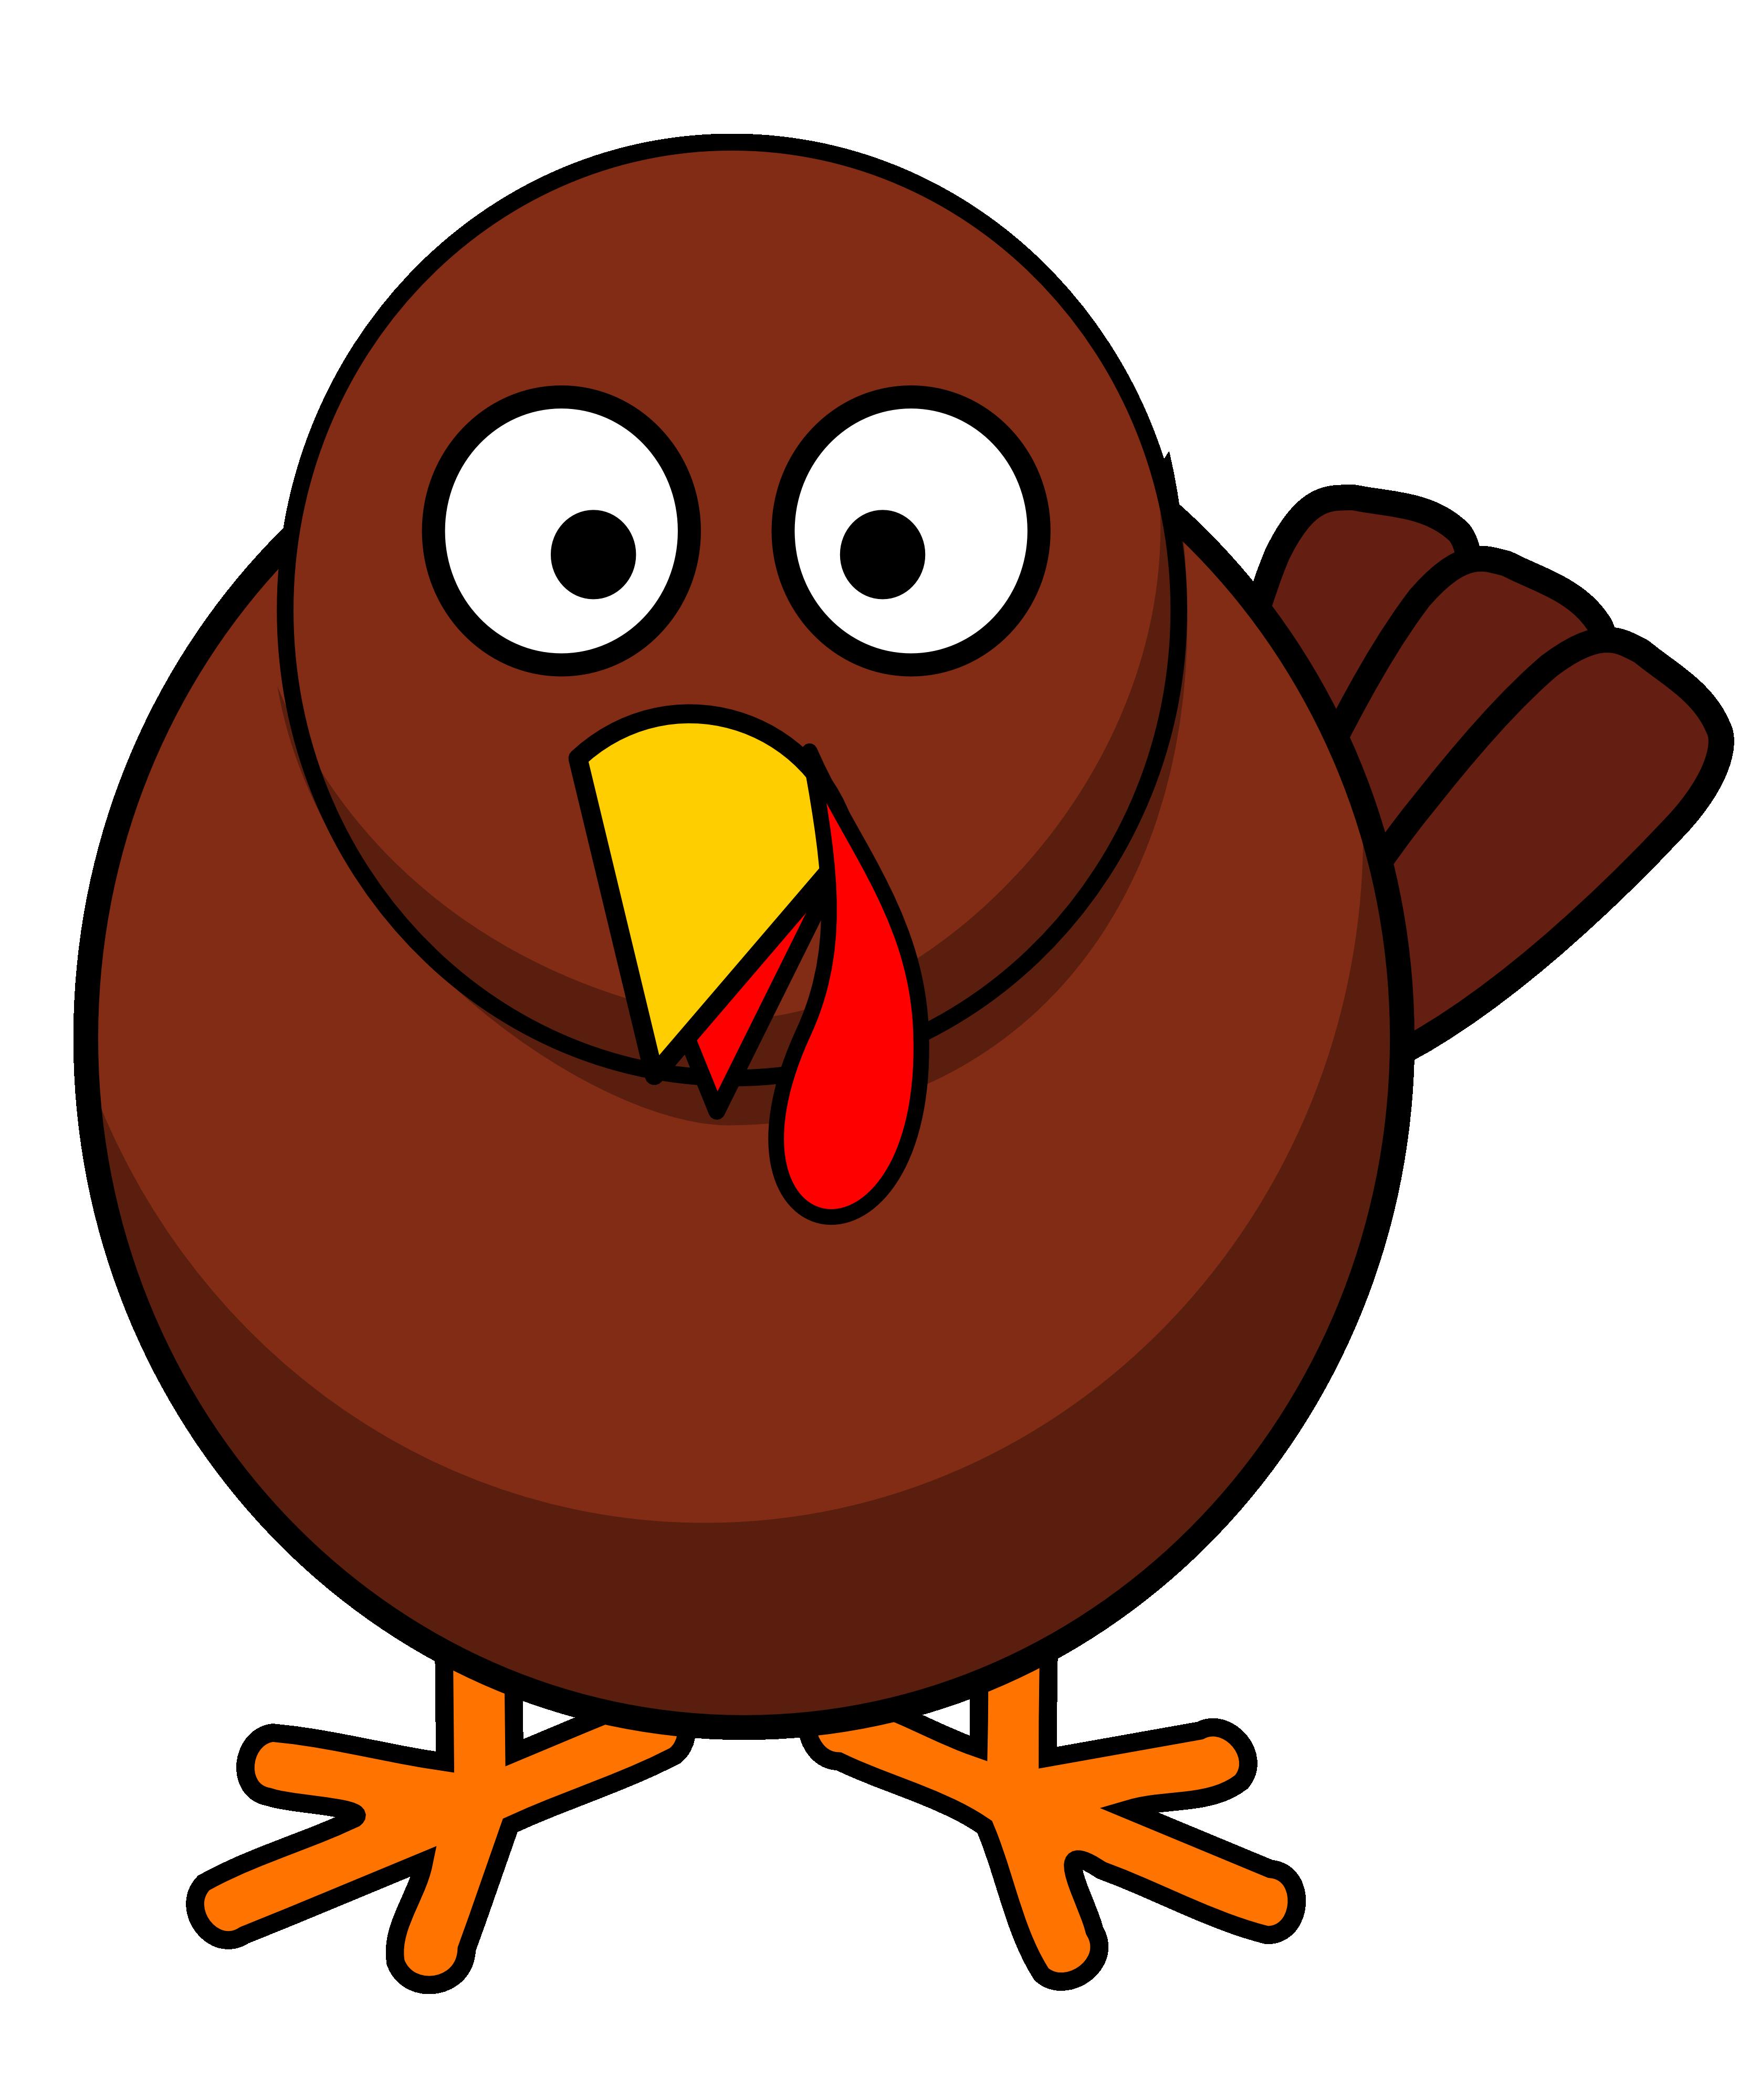 Turkey Clip Art Pictures.